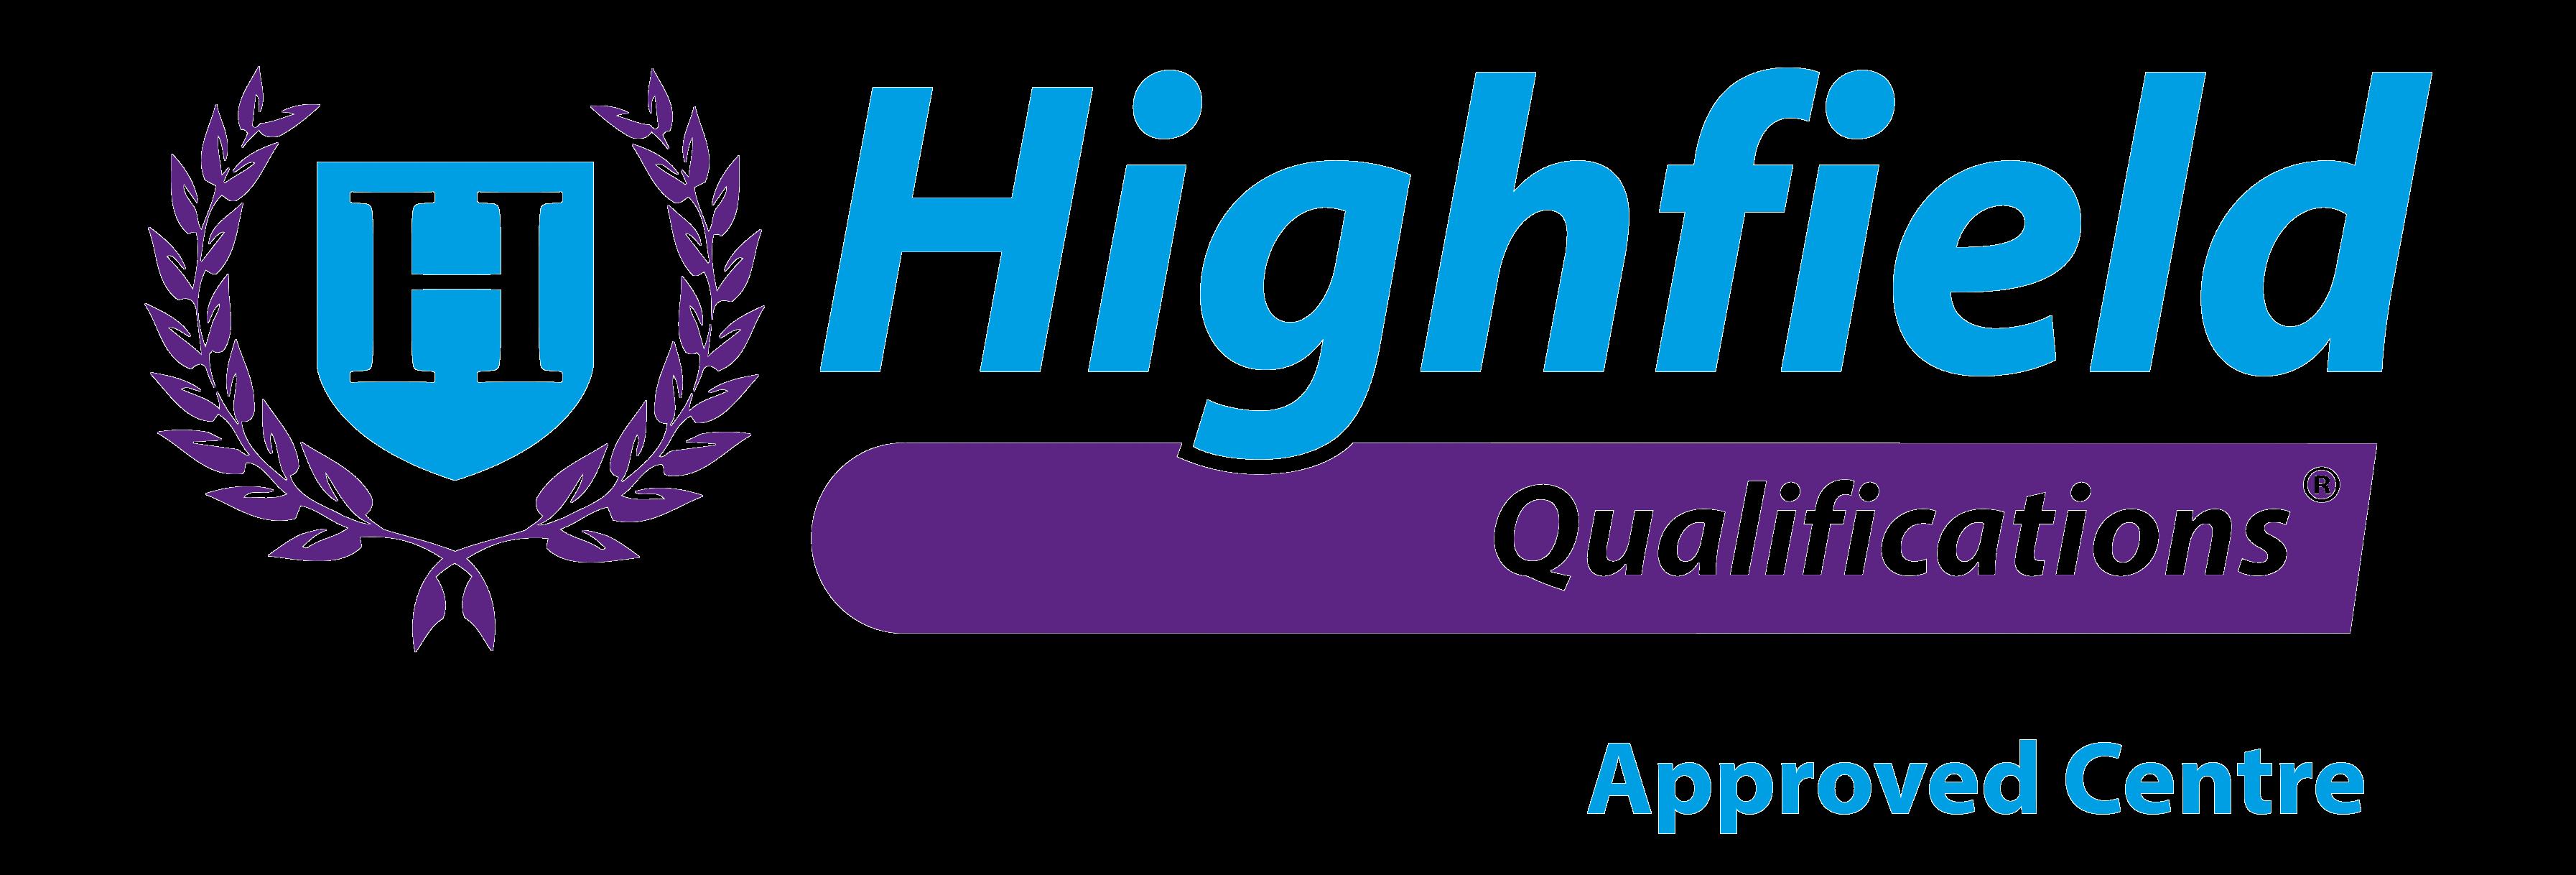 Highfield Qualification logo